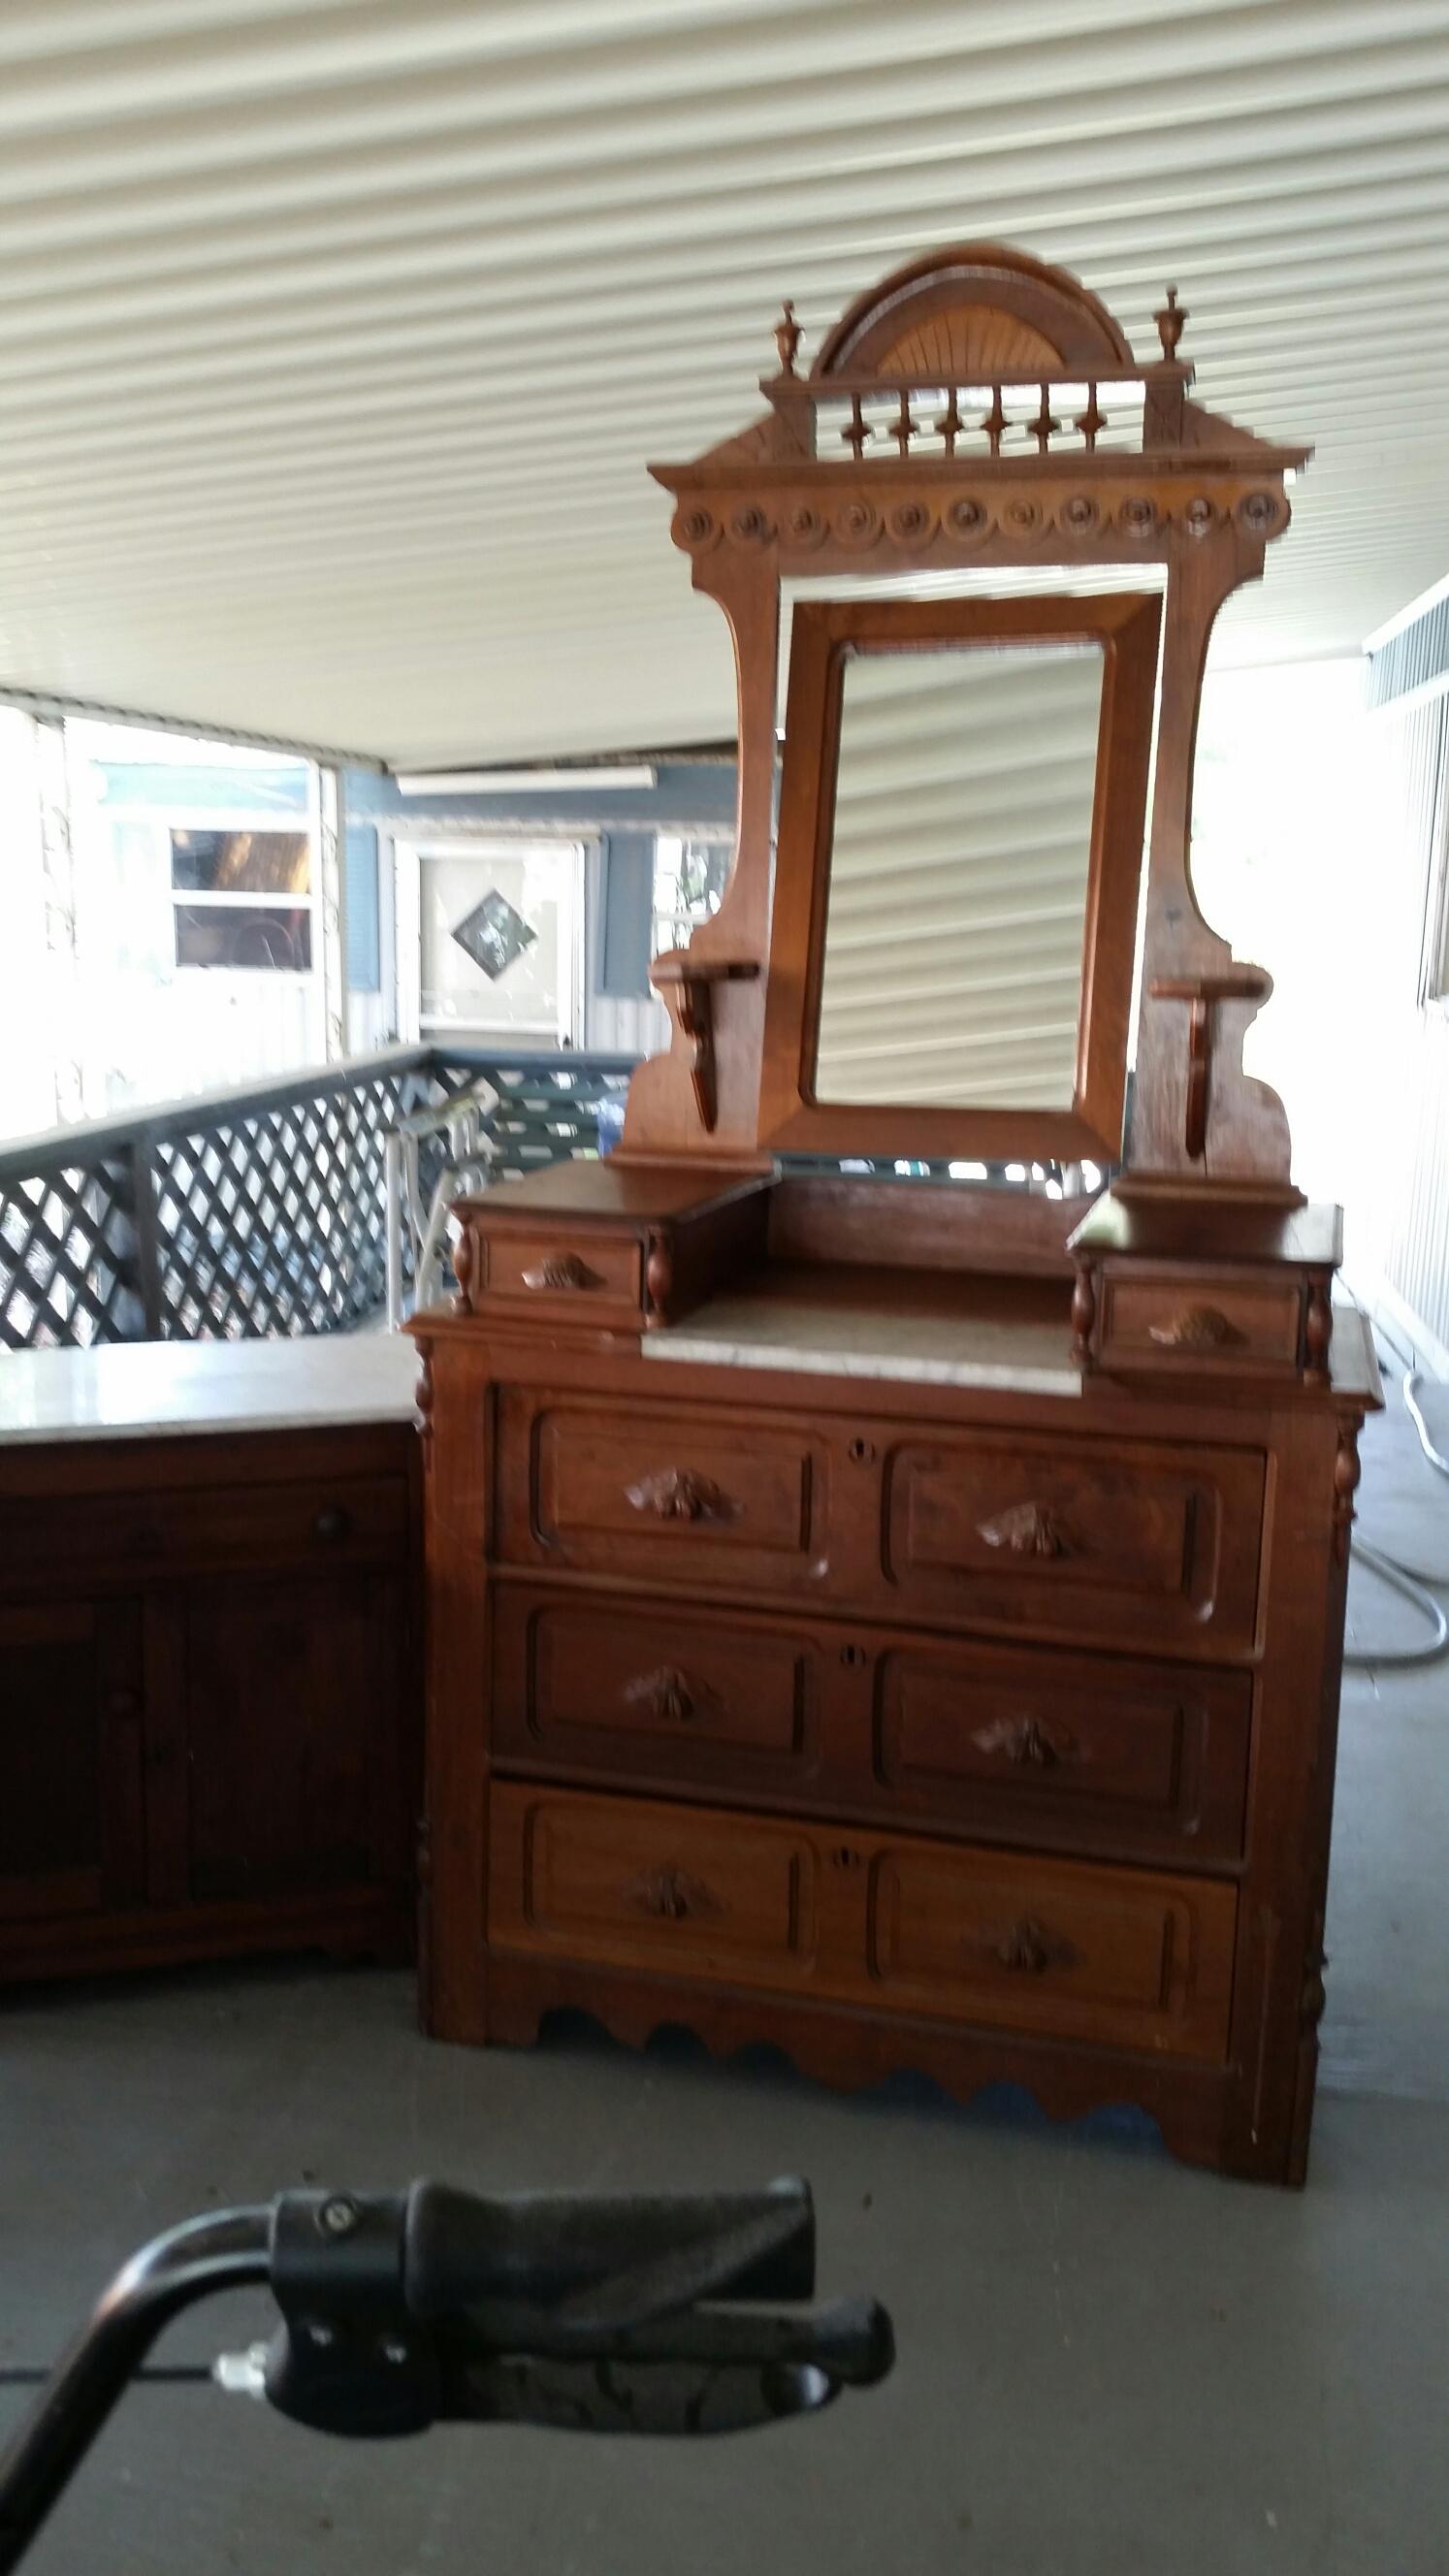 Antique Dresser and Mirror antique appraisal | InstAppraisal